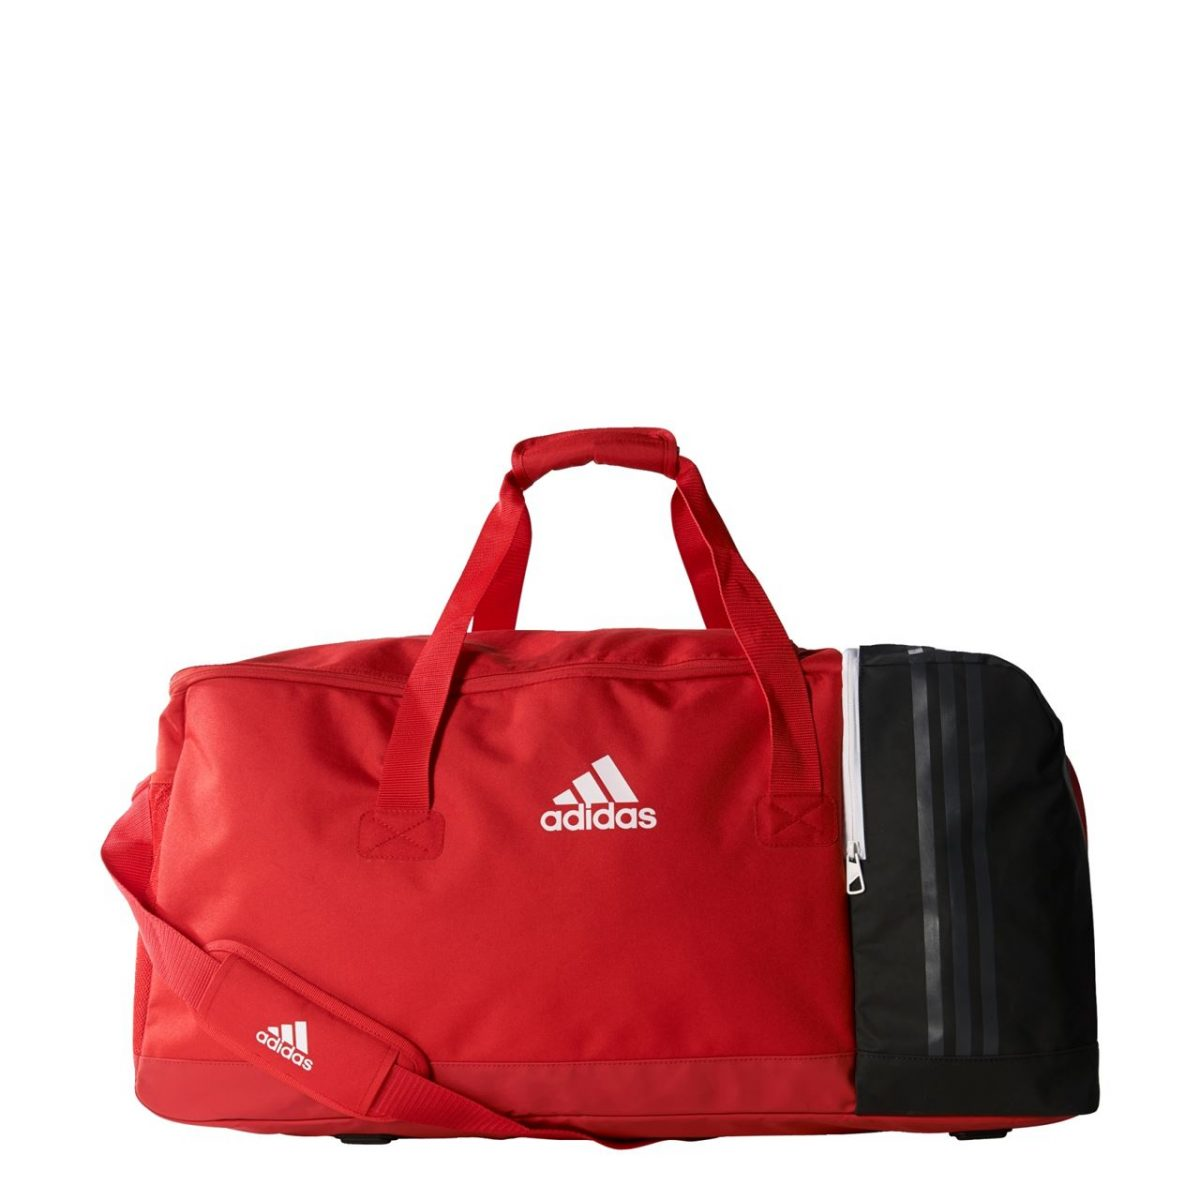 Adidas Tiro Teambag L